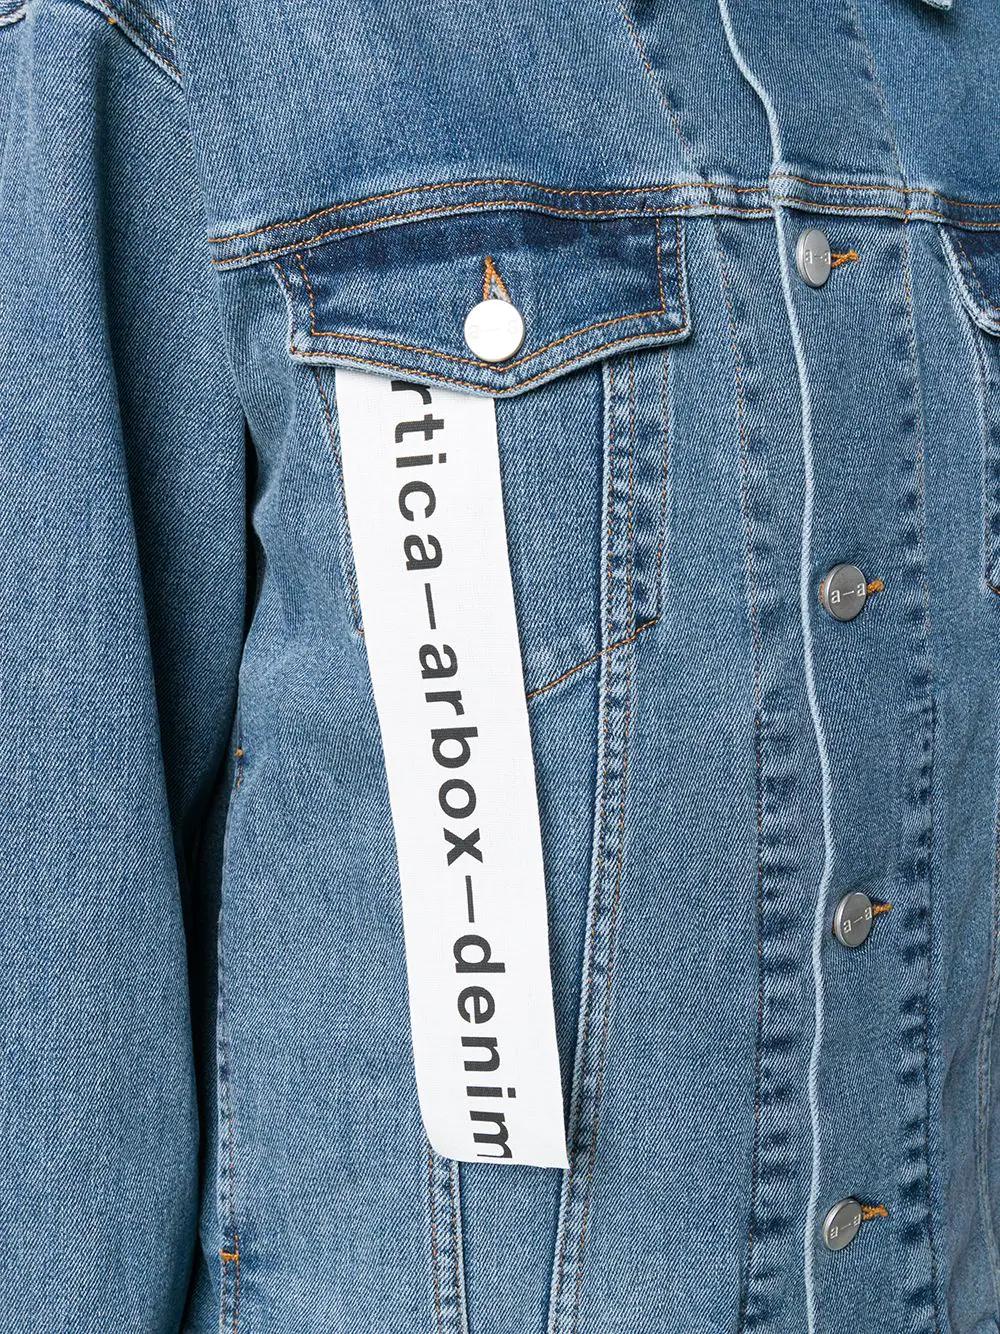 Artica Arbox | Artica Arbox джинсовая куртка с логотипом | Clouty